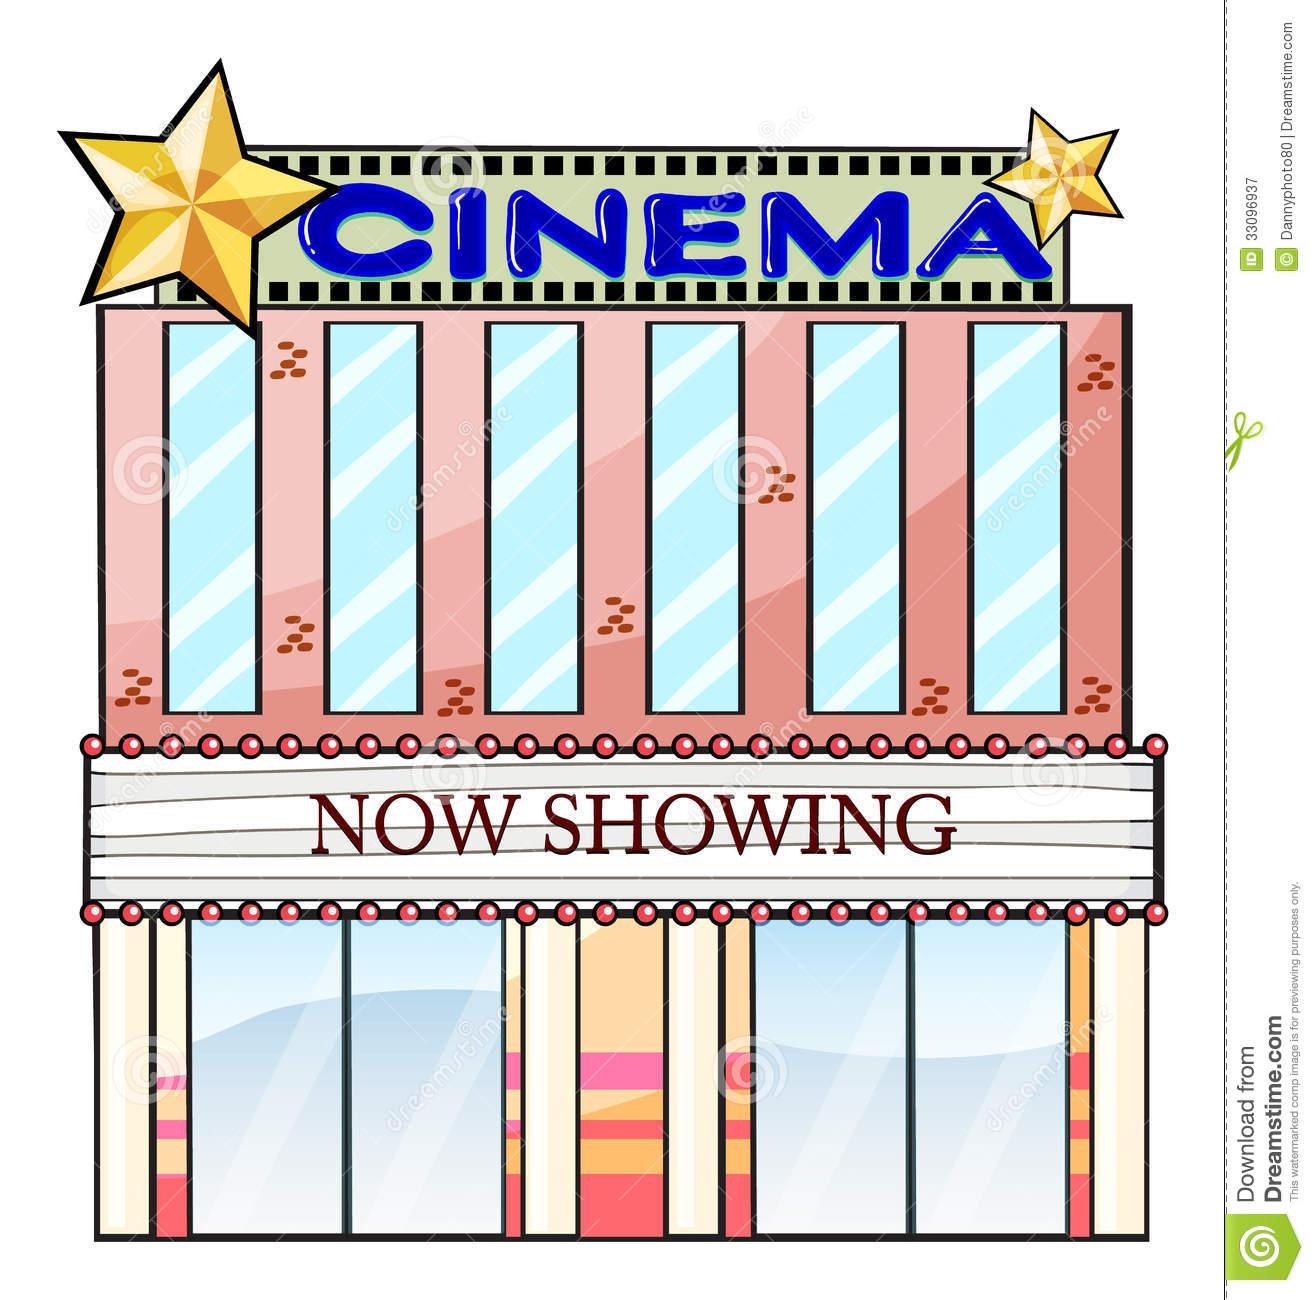 Movie Theatre Building Clipart.